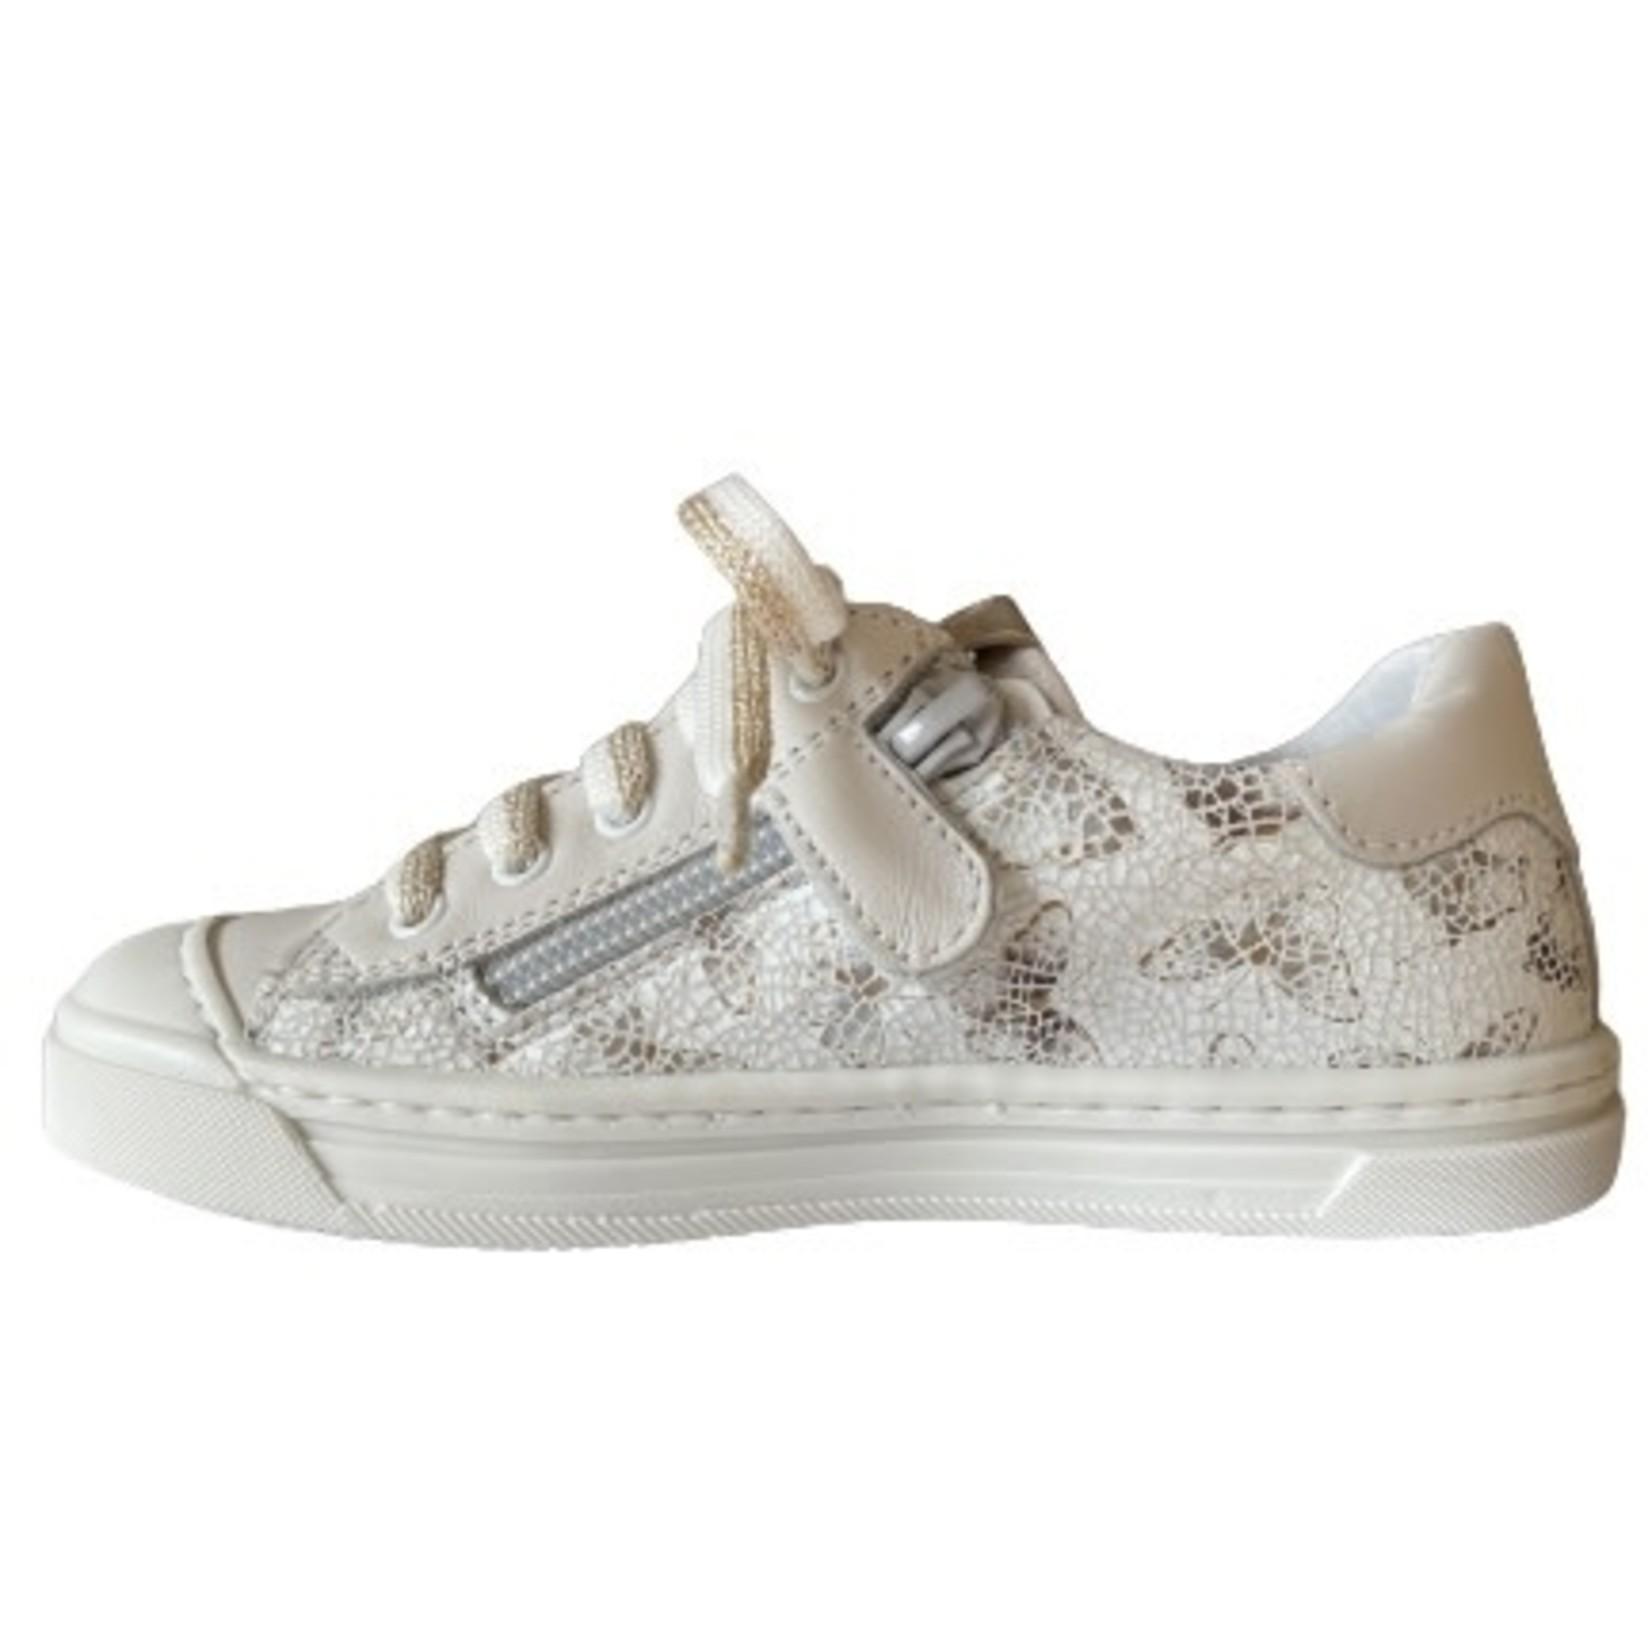 Fr. Romag Fr. Romag Sneaker Wit/goud